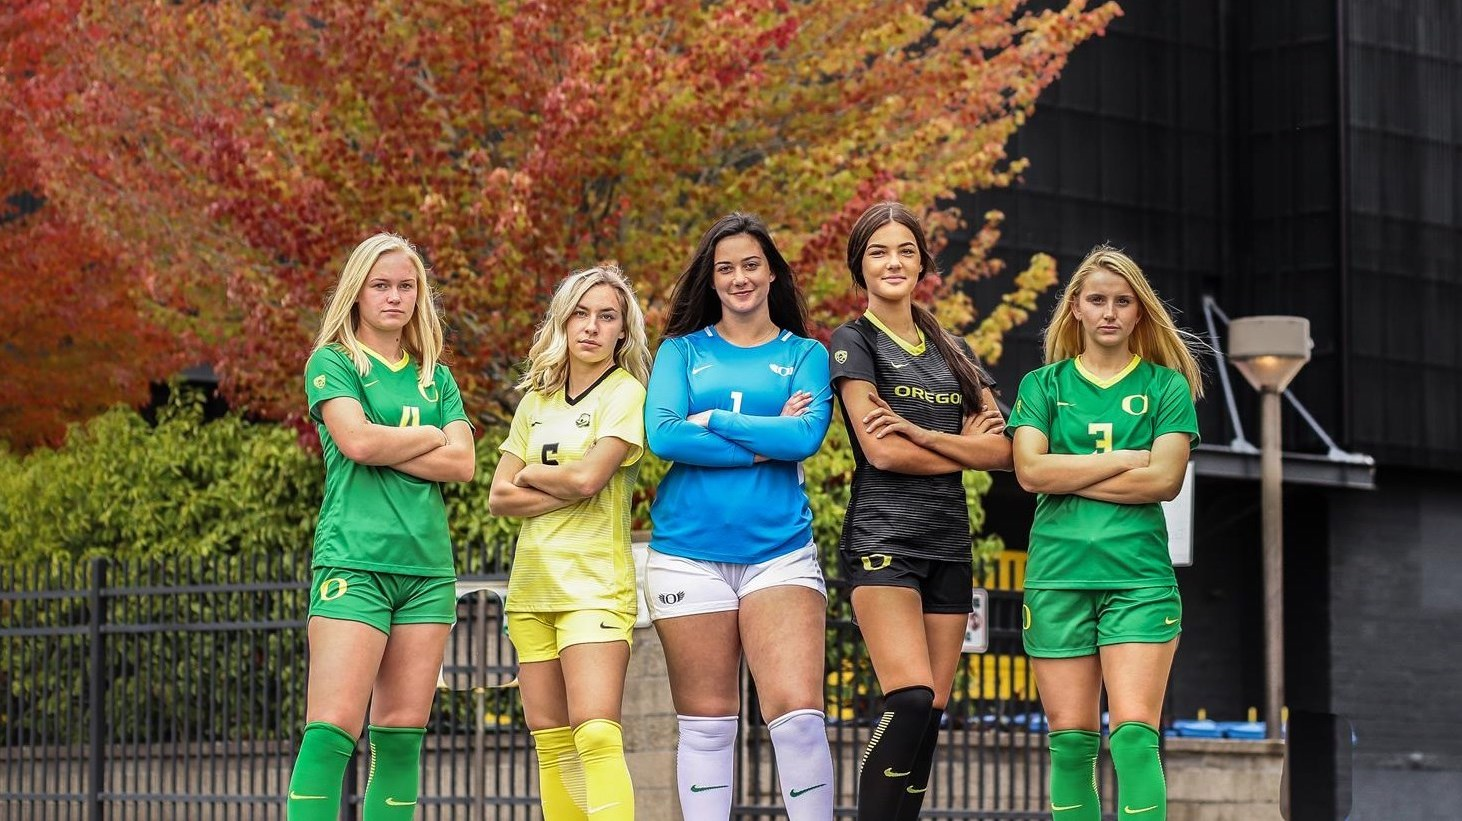 Photos: Oregon women make history at NCAA track and field